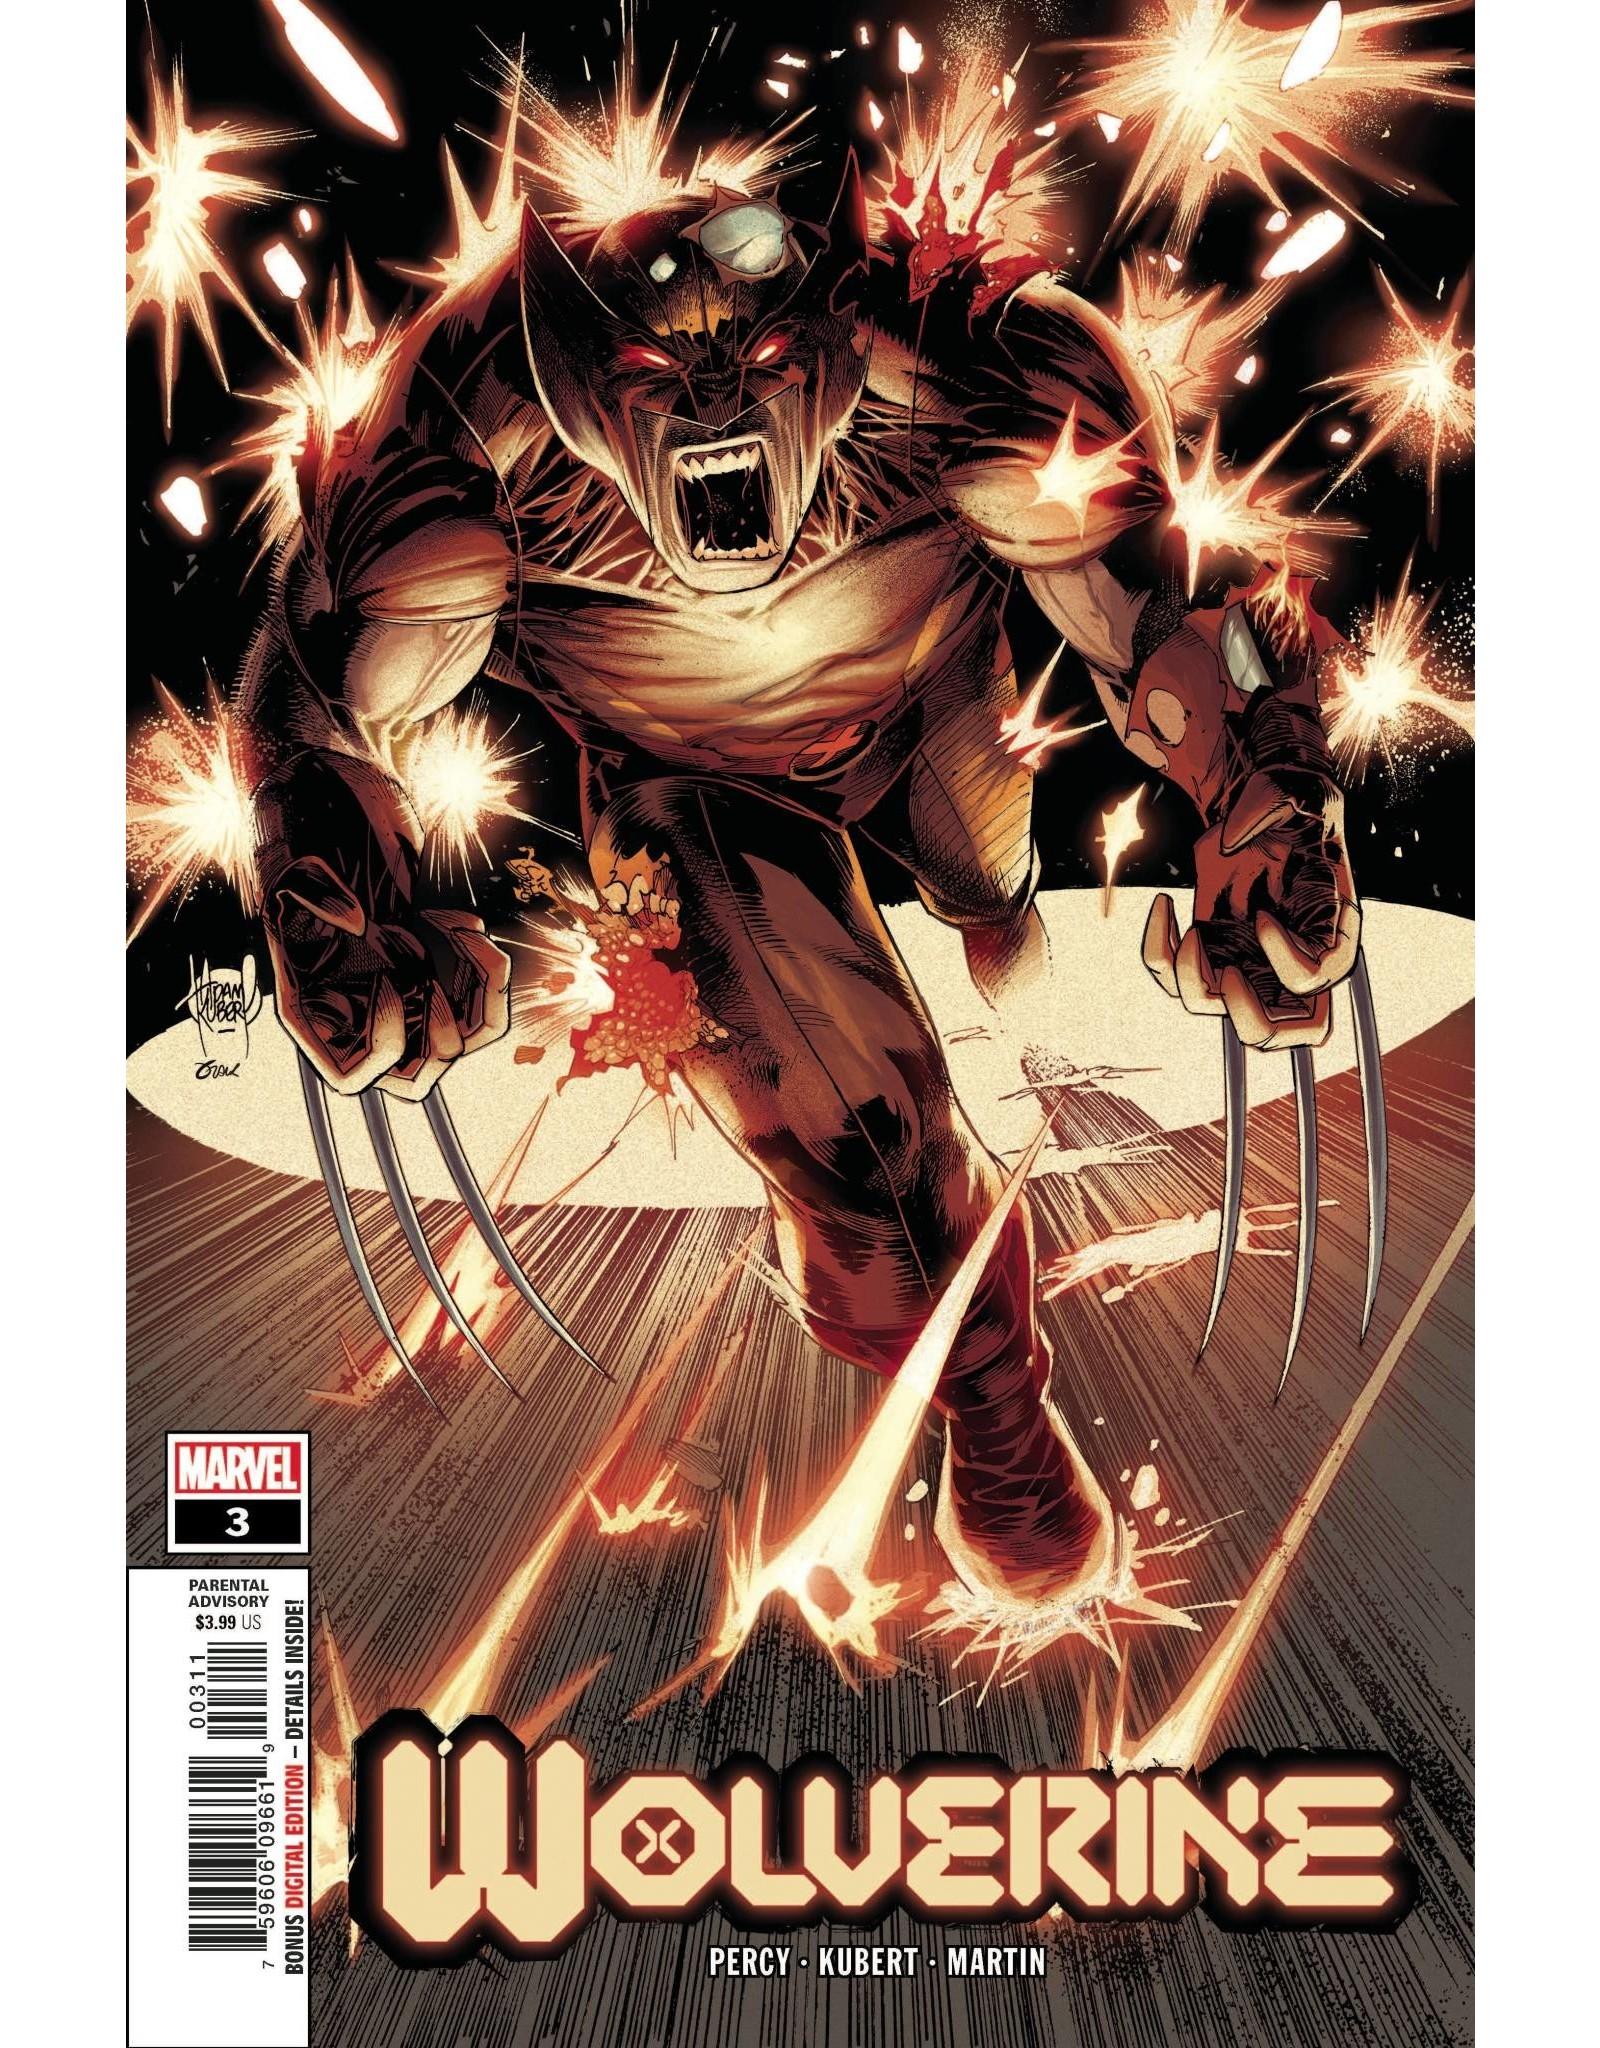 MARVEL COMICS WOLVERINE #3 DX